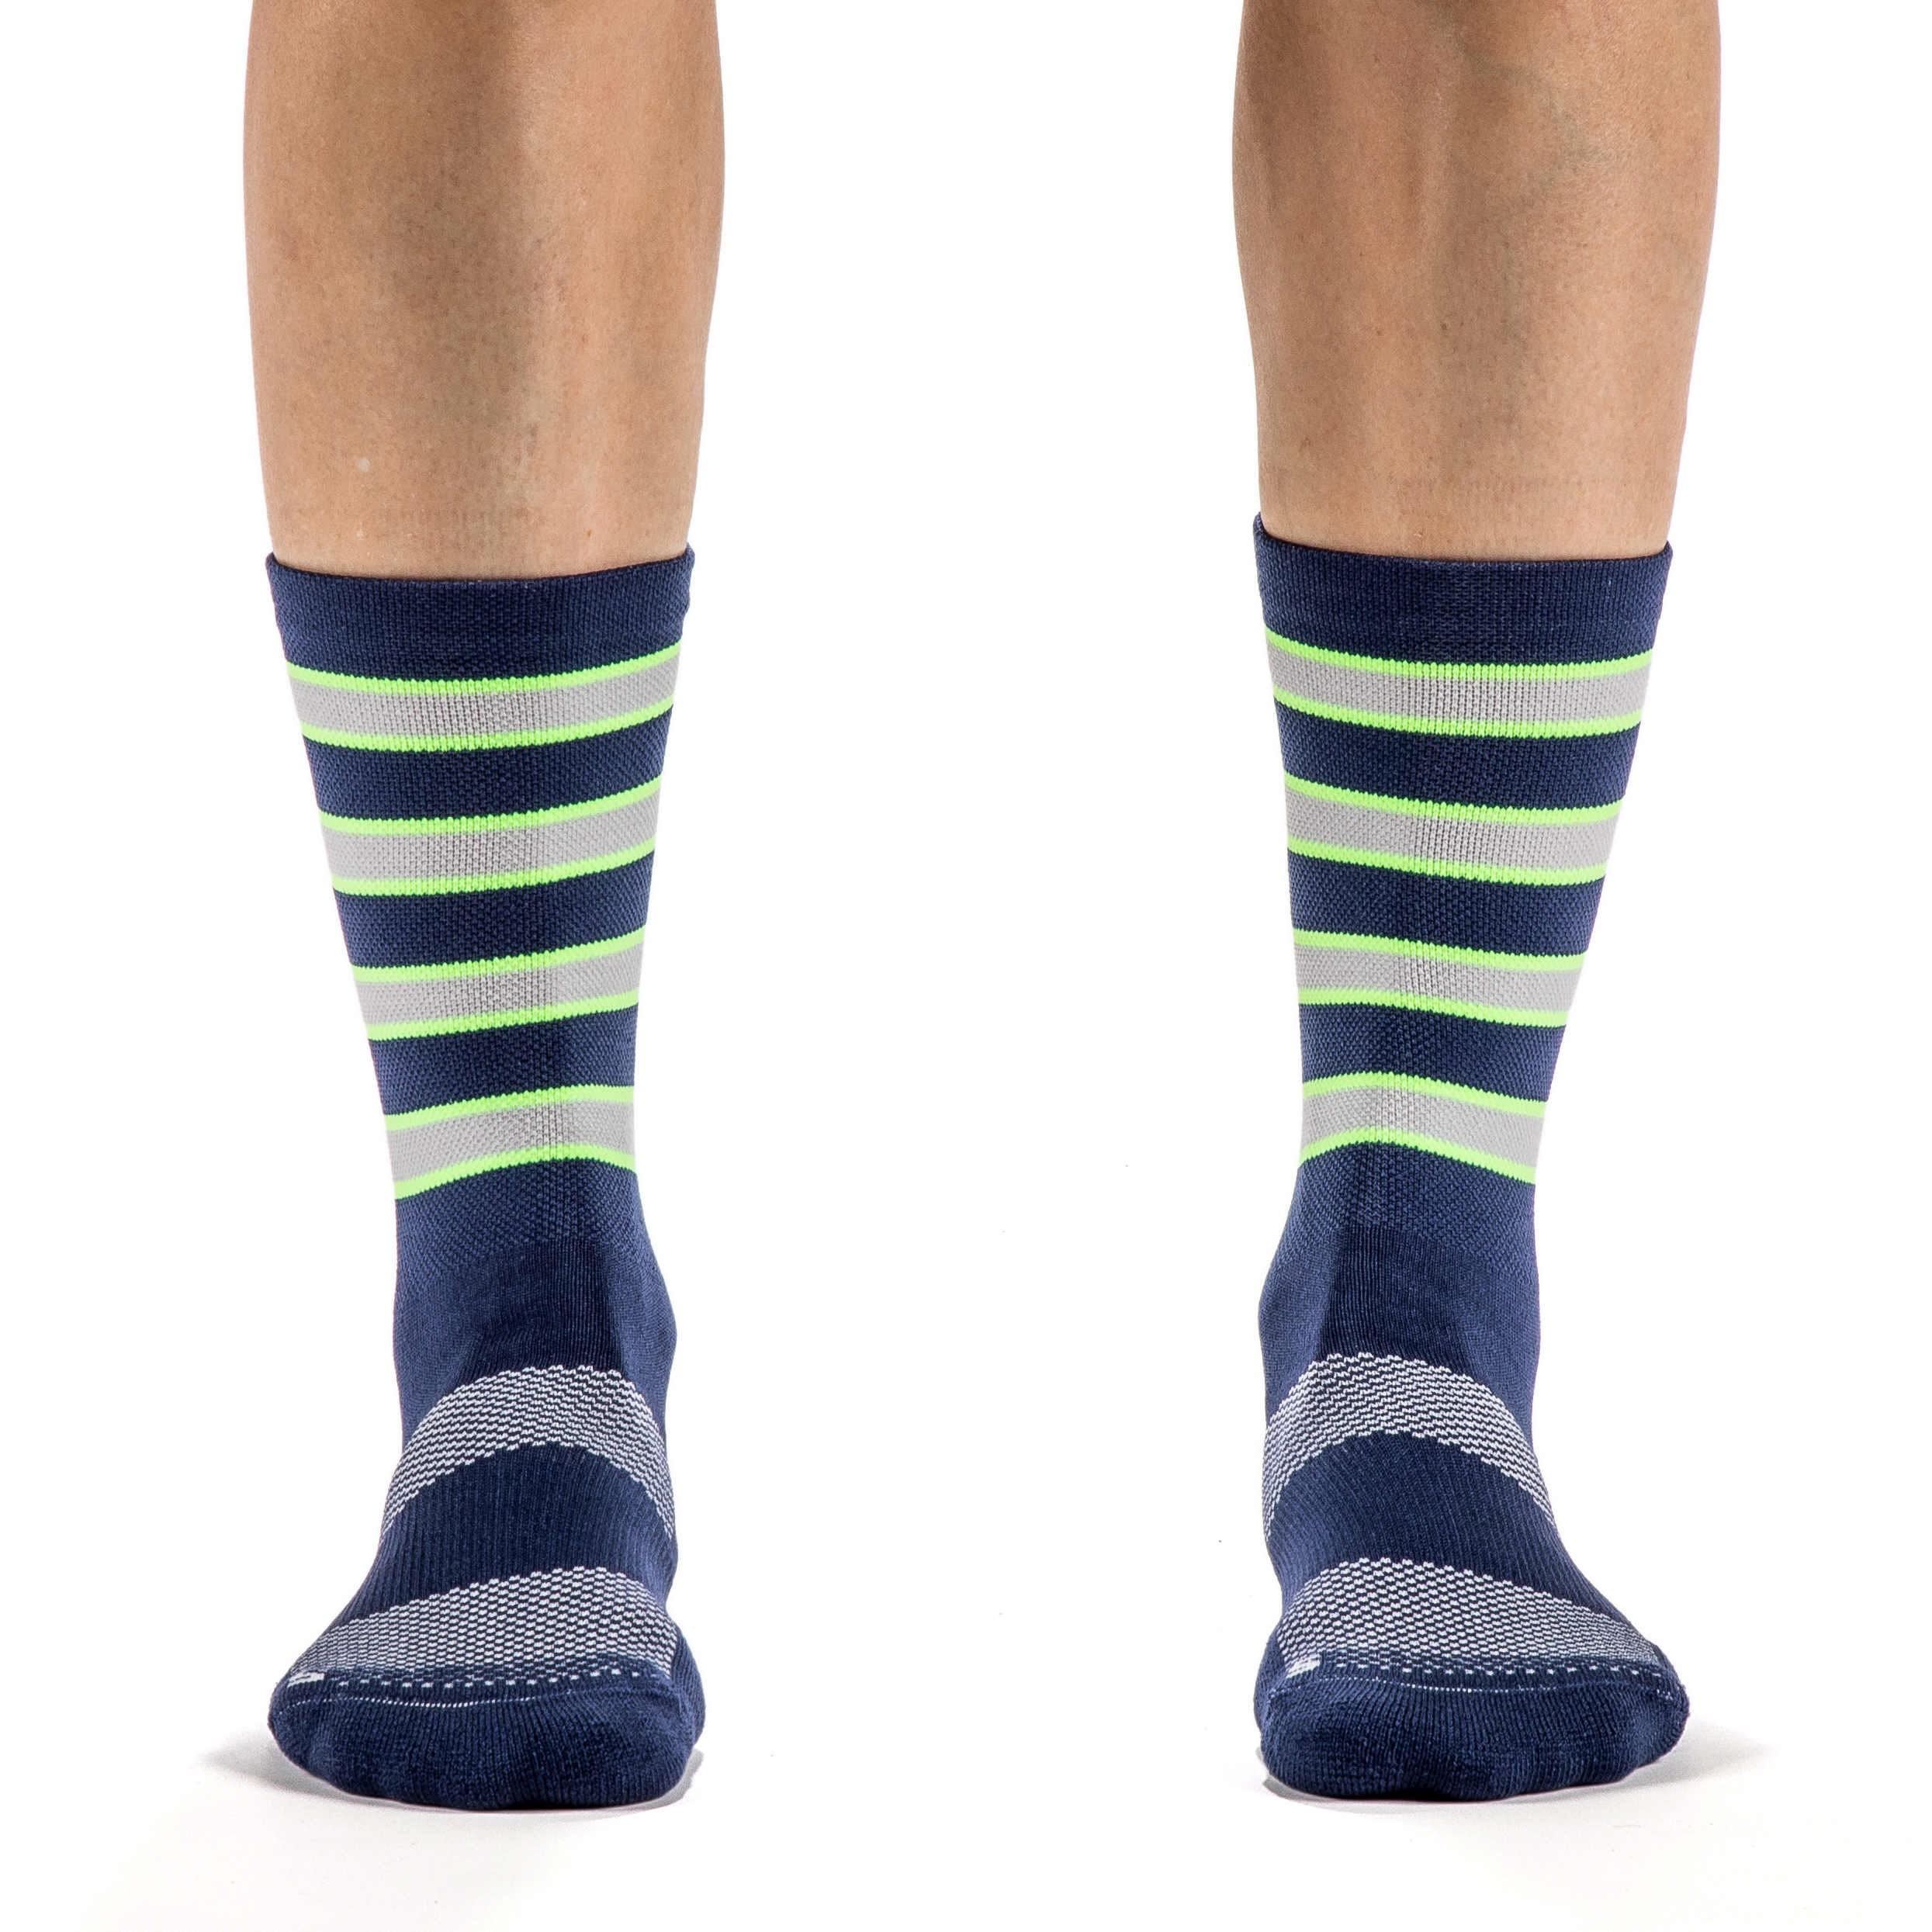 Small batch socks for endurance athletes by stokesignalstudio